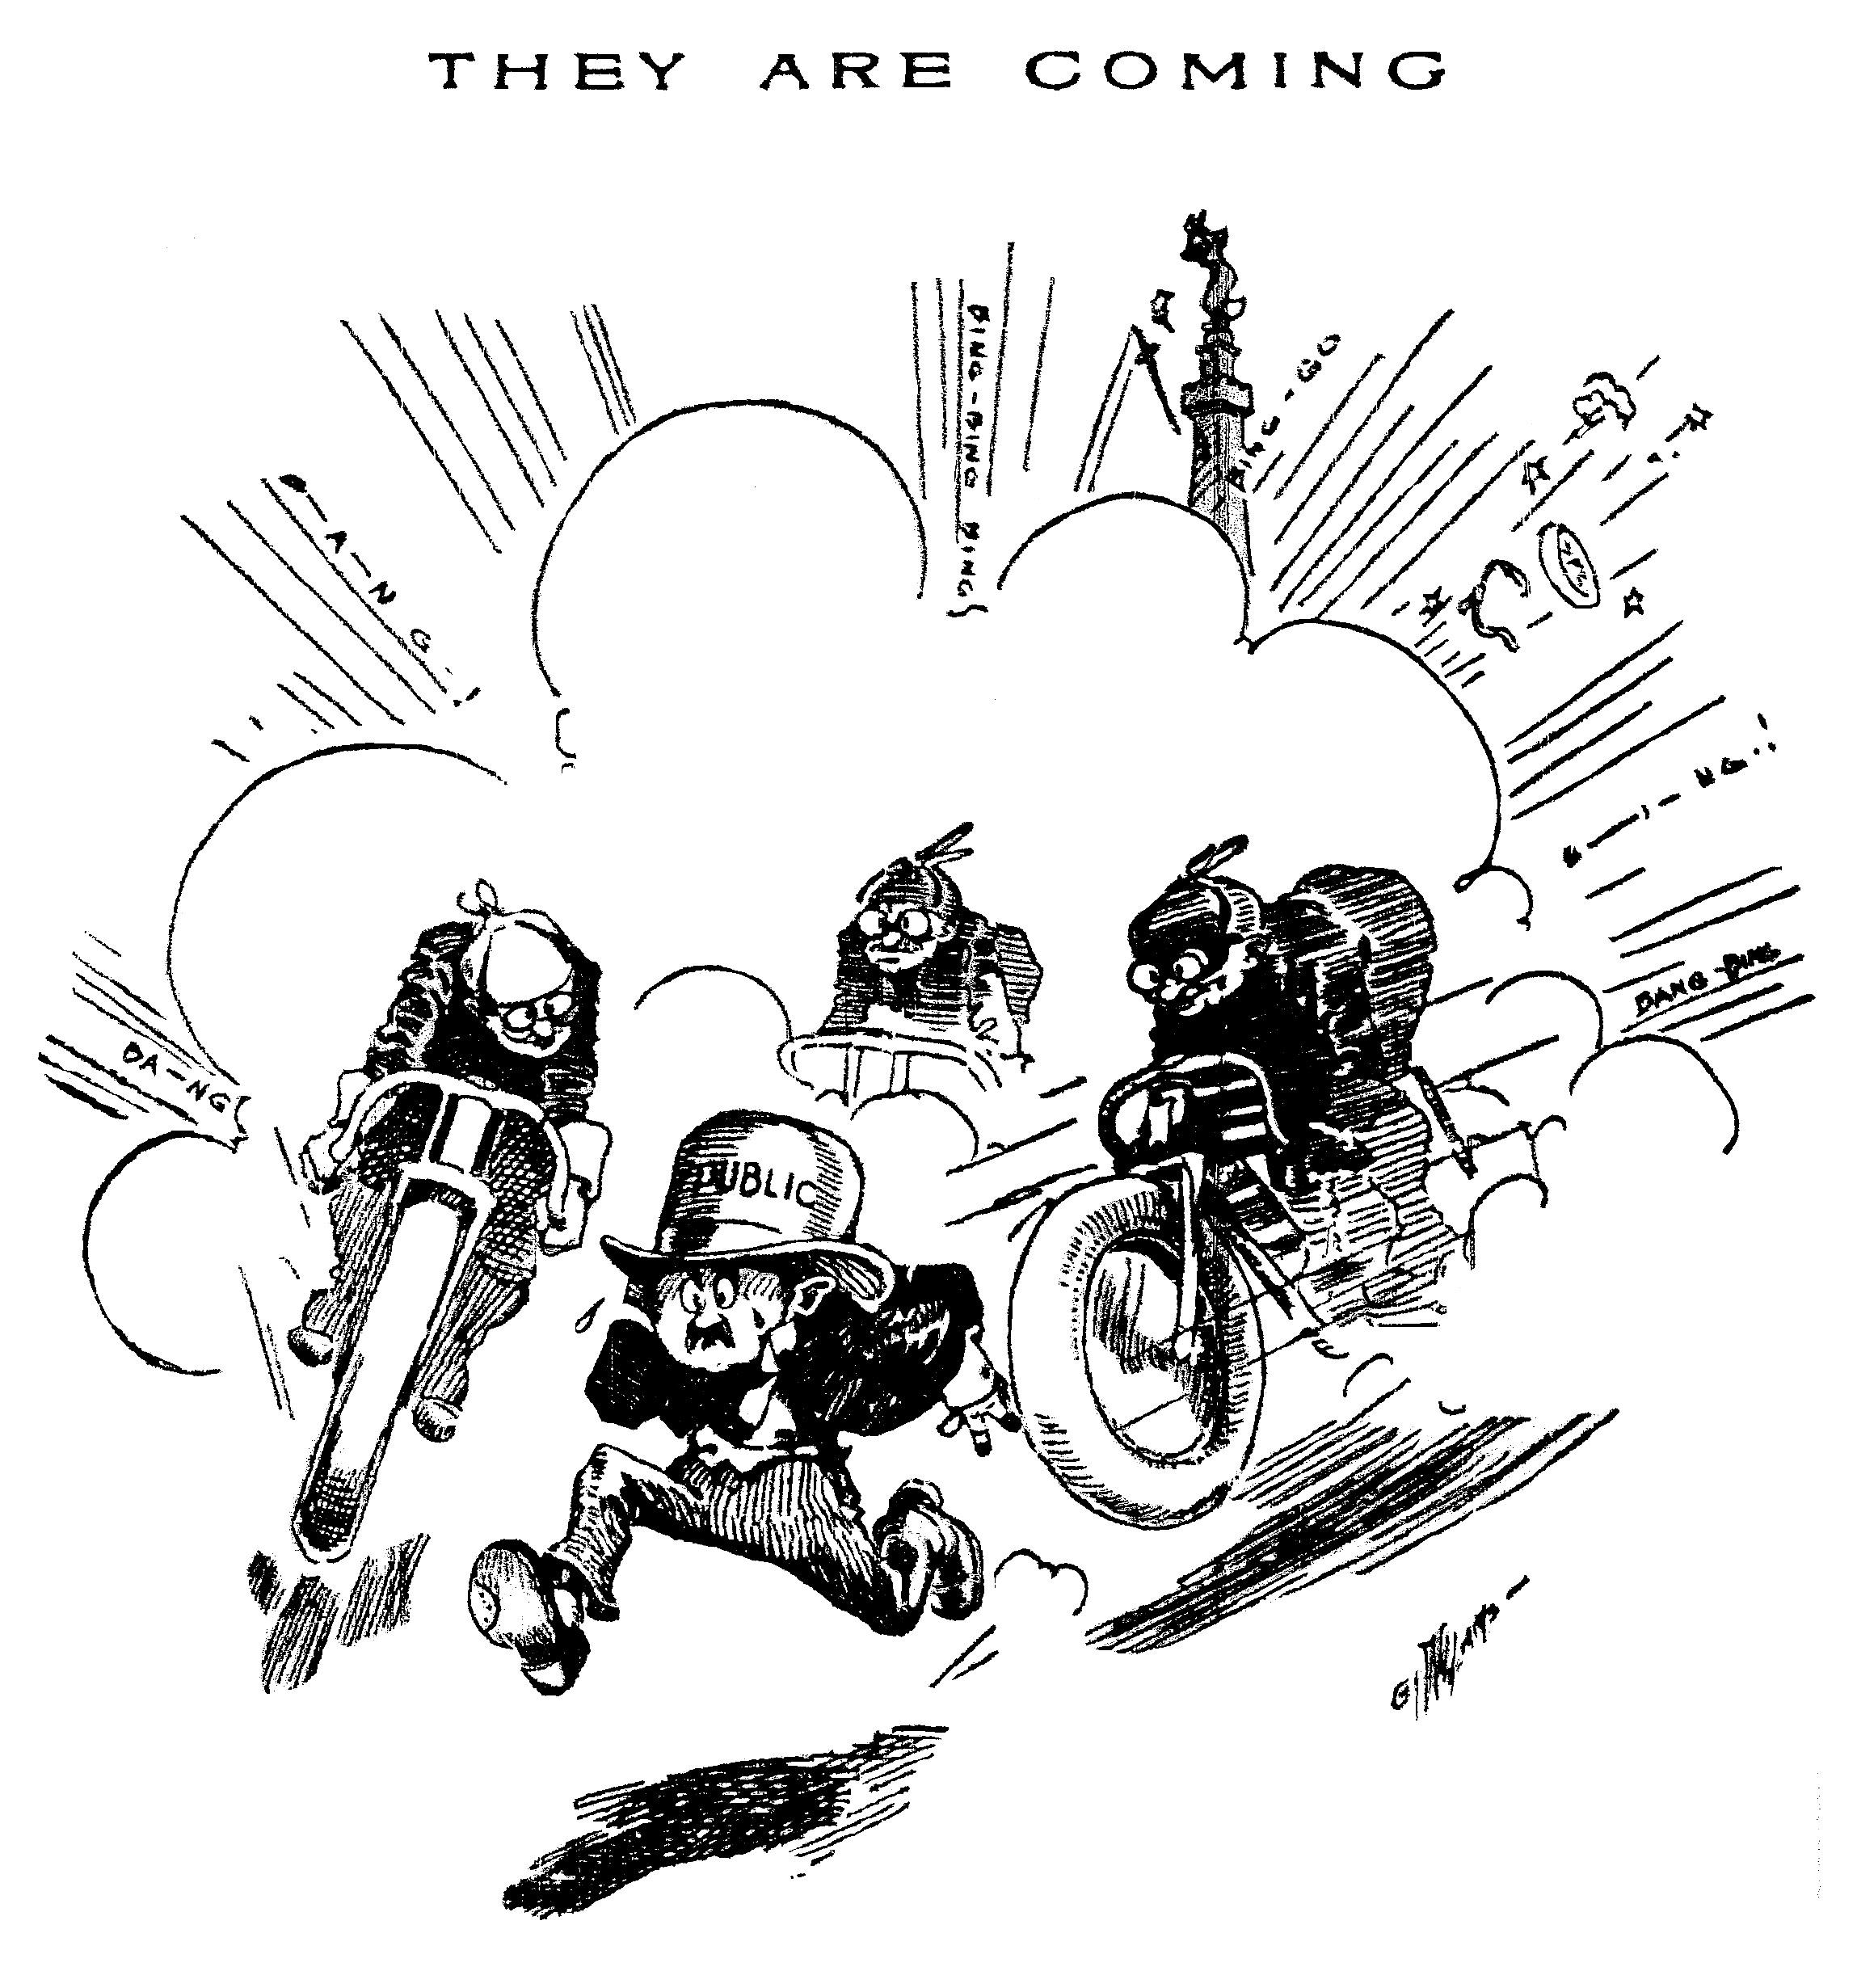 1909 Motorcycle Races!